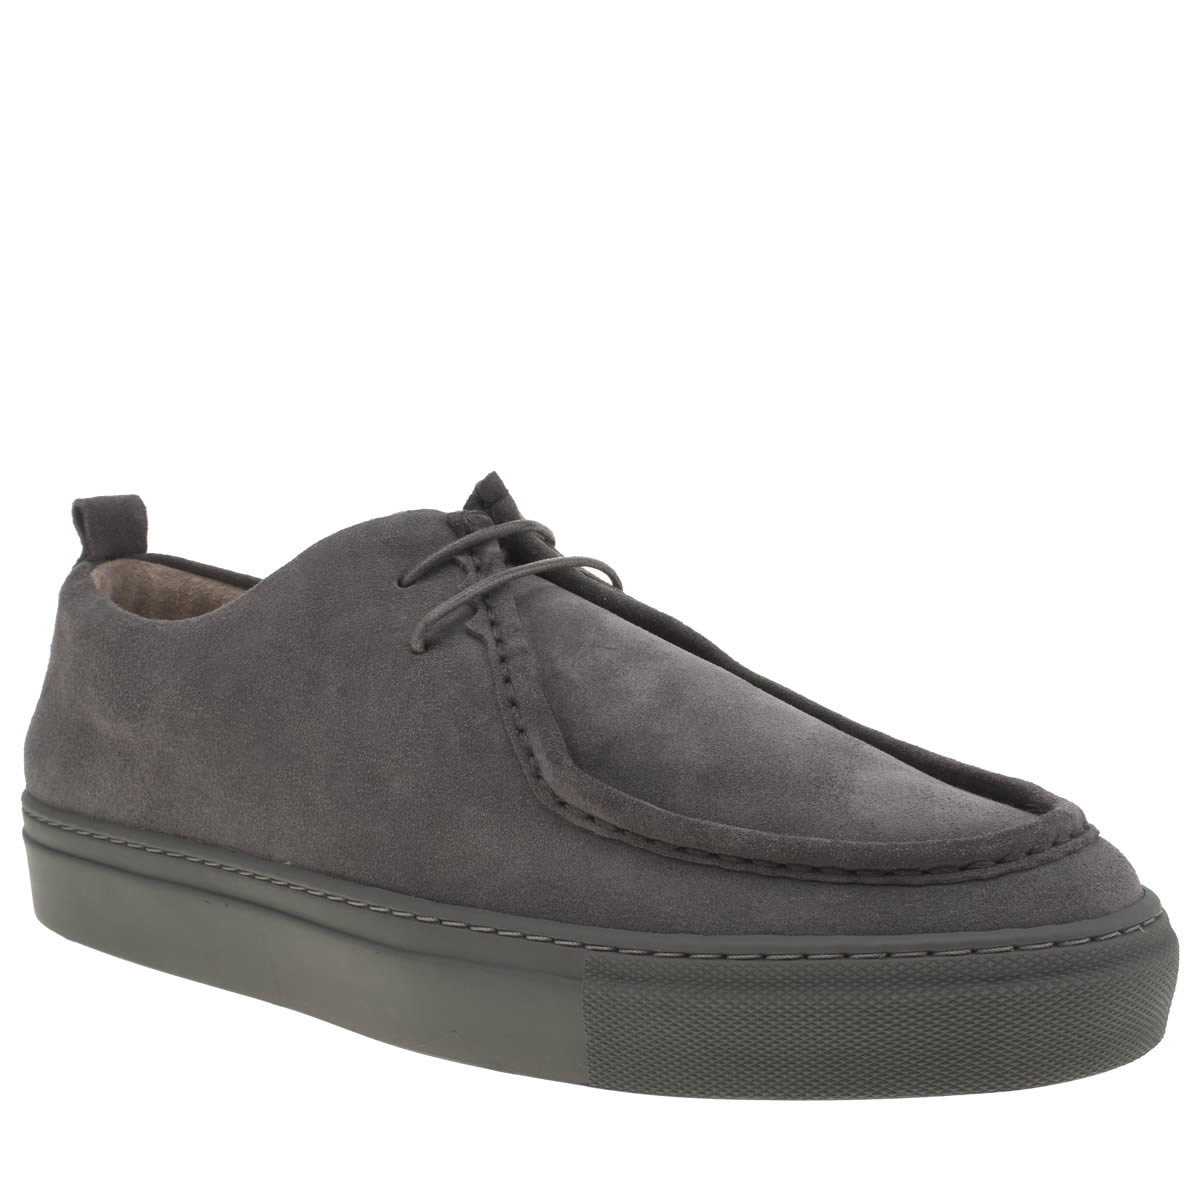 Northern Cobbler Northern Cobbler Grey Trainer Lo Shoes